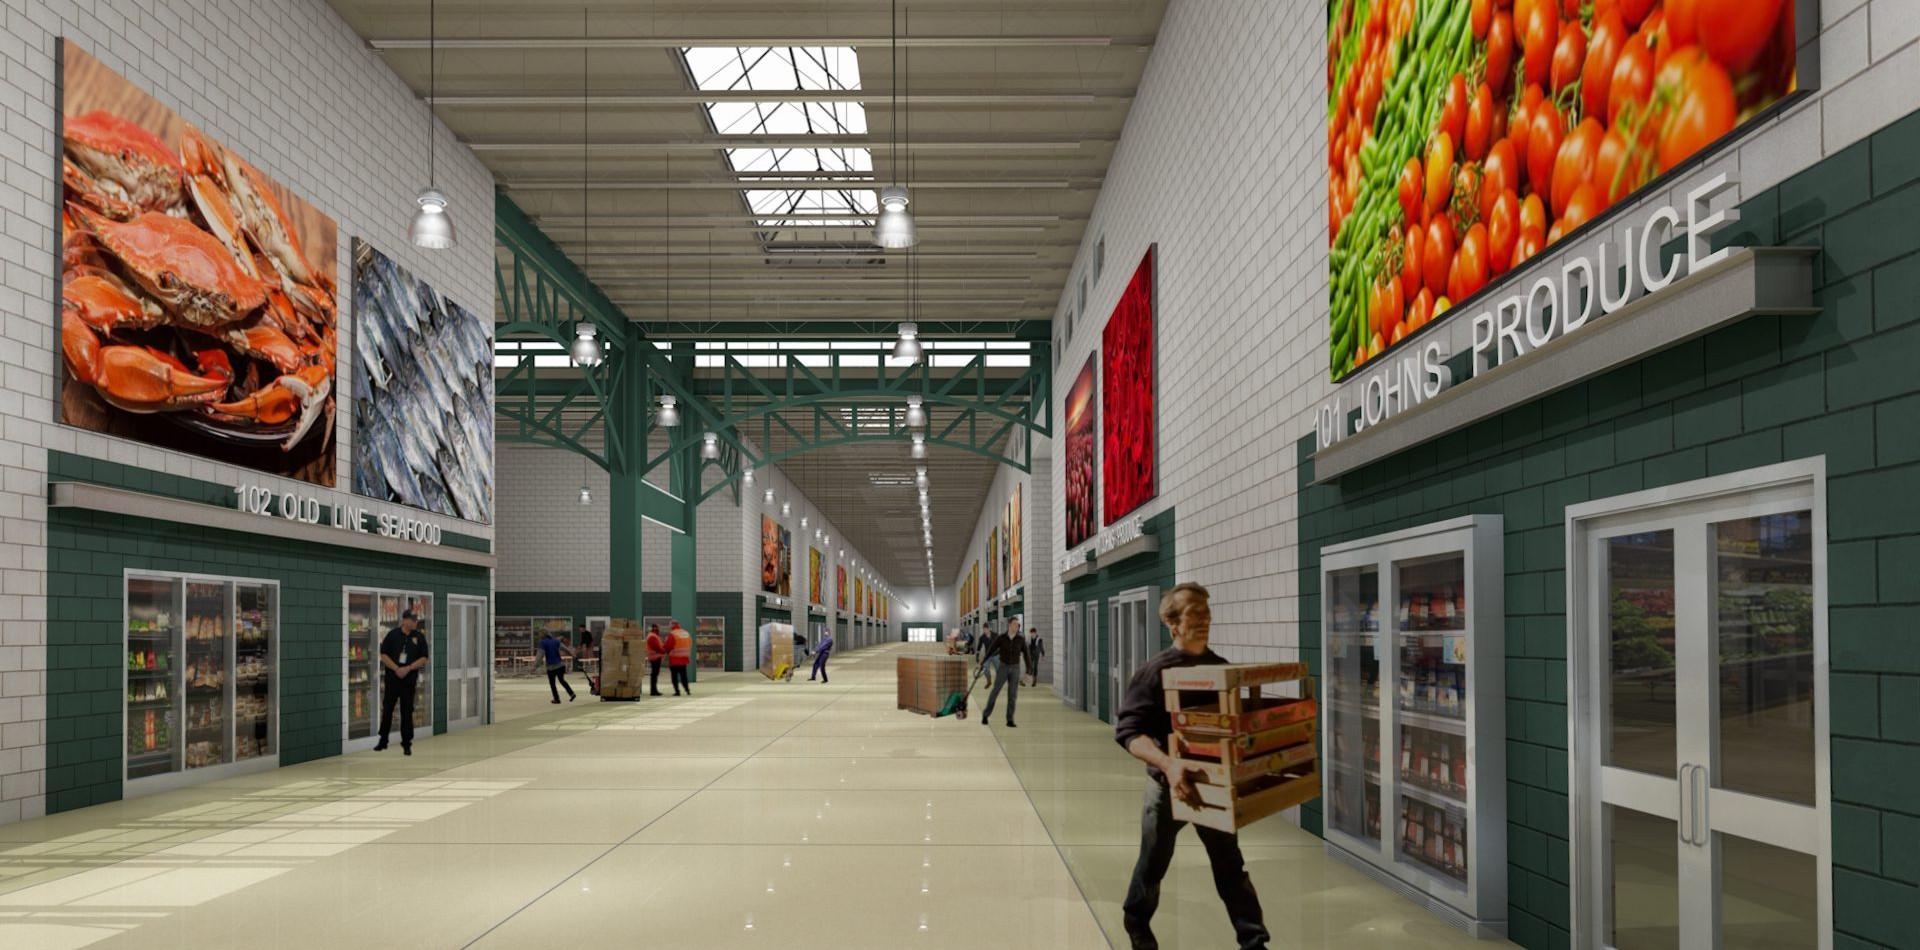 Wholesale Food Market - Interior